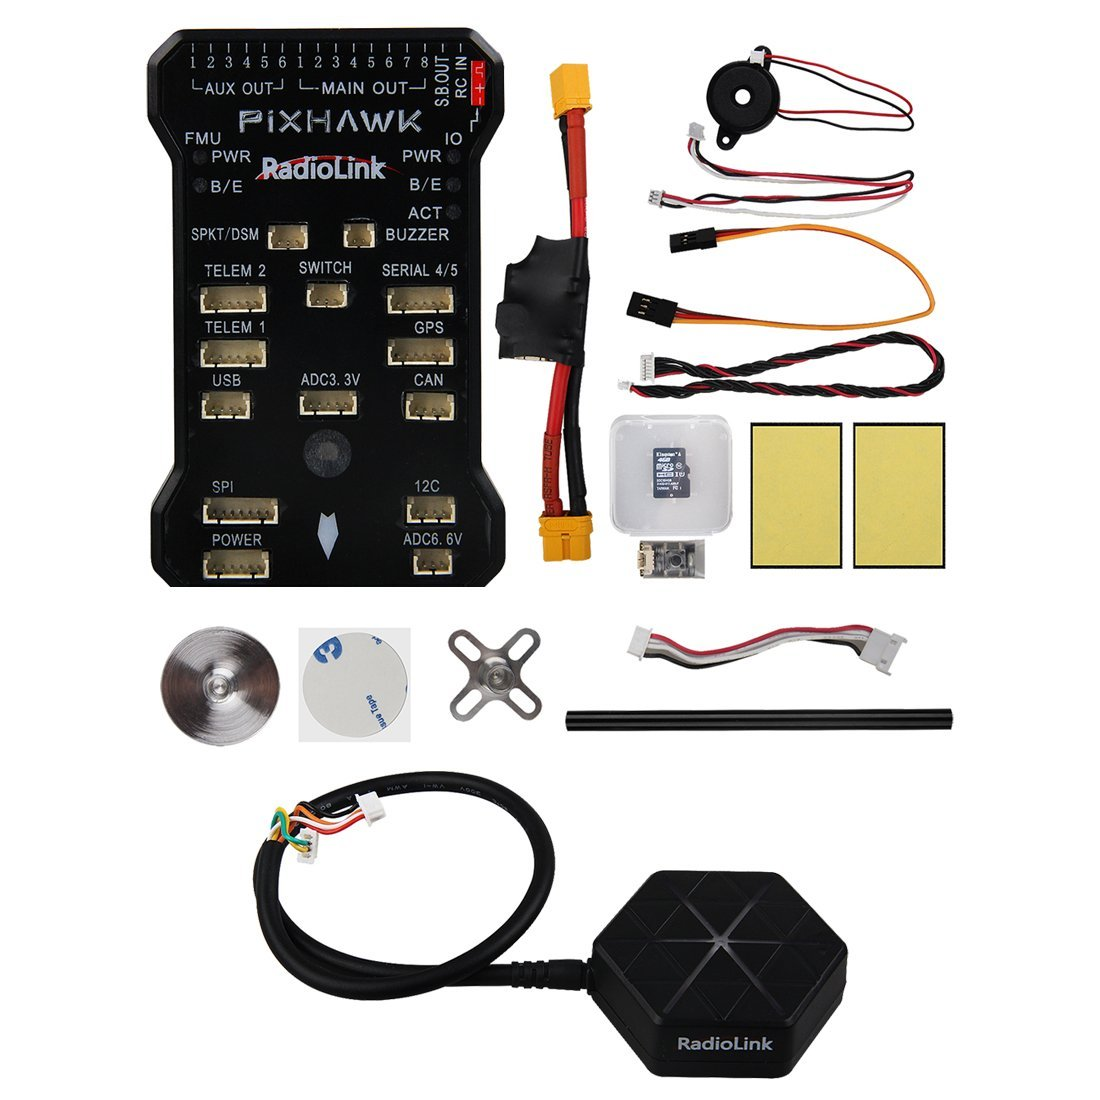 Radiolink Pixhawk 32 Bit ARM Flight Controller + NEO-M8N GPS